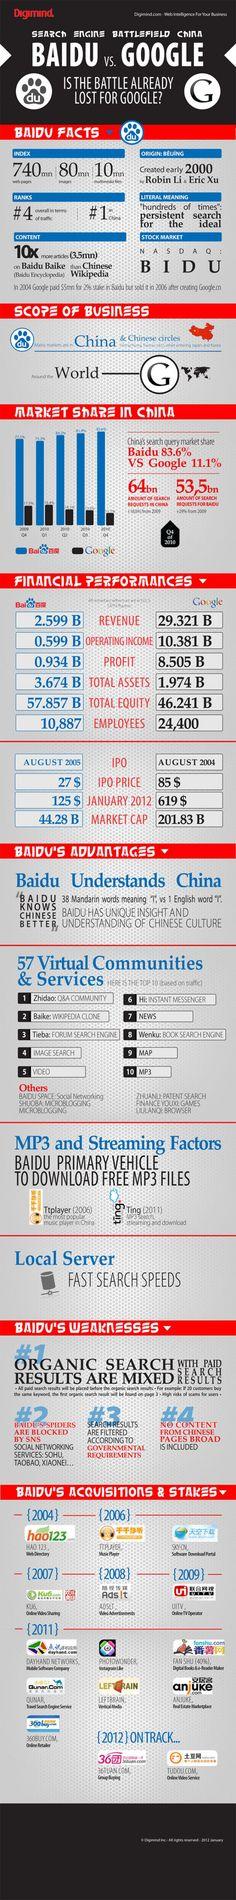 Baidu vs Google #infografia #infographic #internet